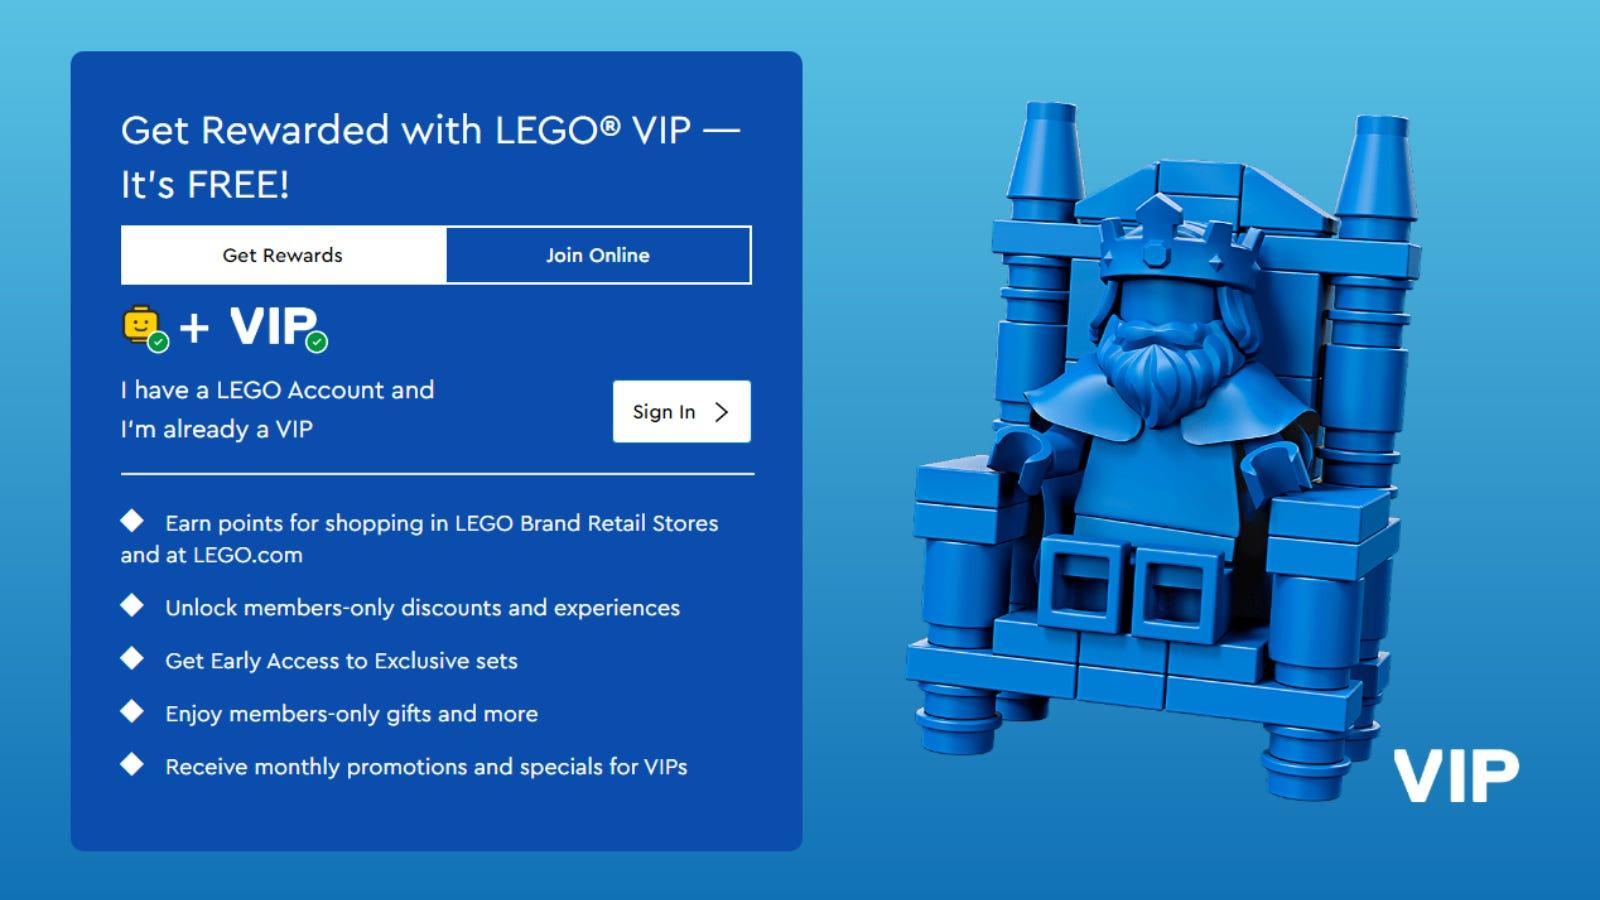 LEGO VIP rewards advertising page